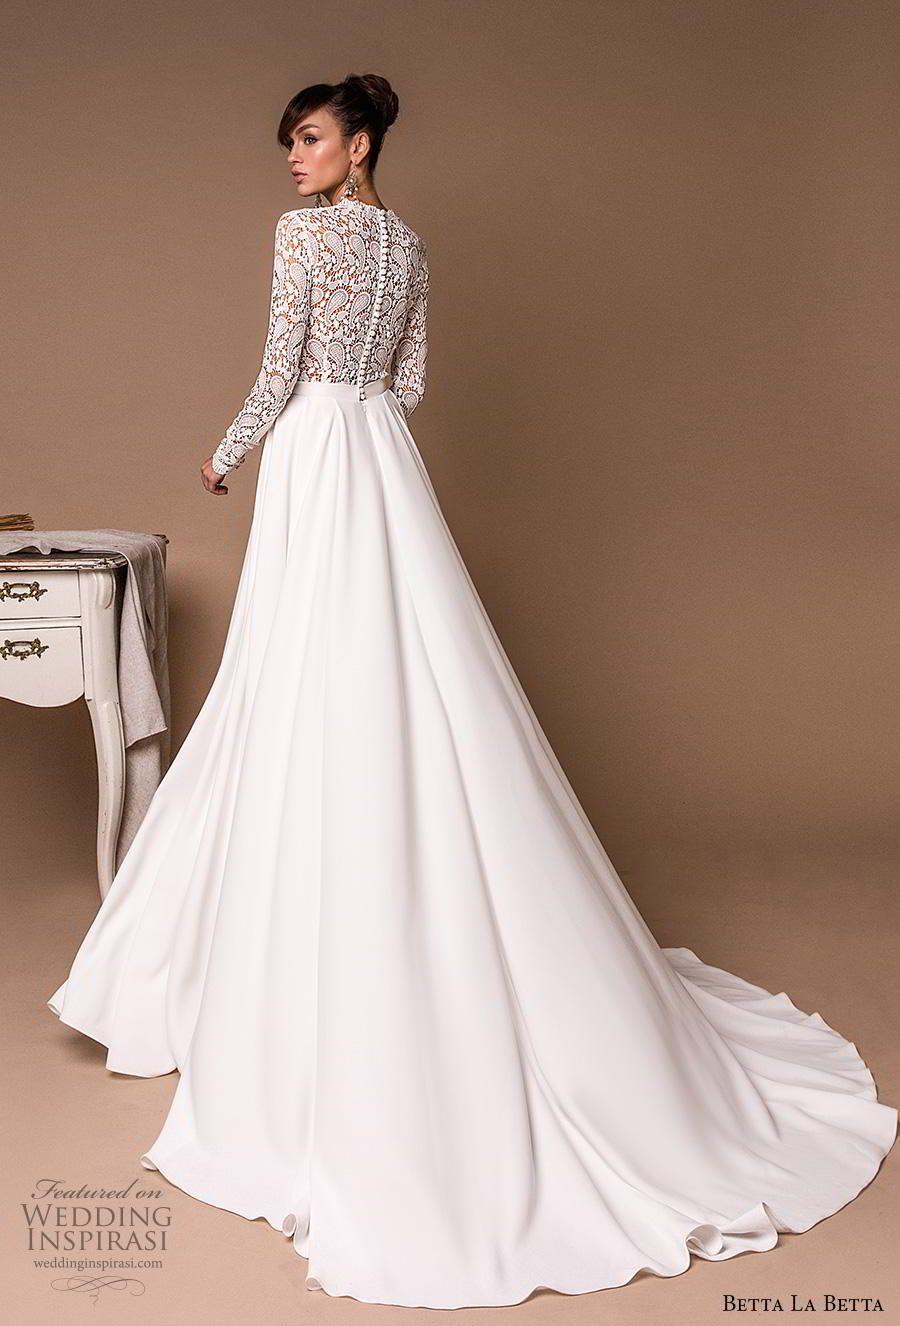 Principal Sponsor Ninang Gown Simple Style Formal Dresses For Weddings Formal Dresses Formal Wear Dresses [ 1760 x 1196 Pixel ]